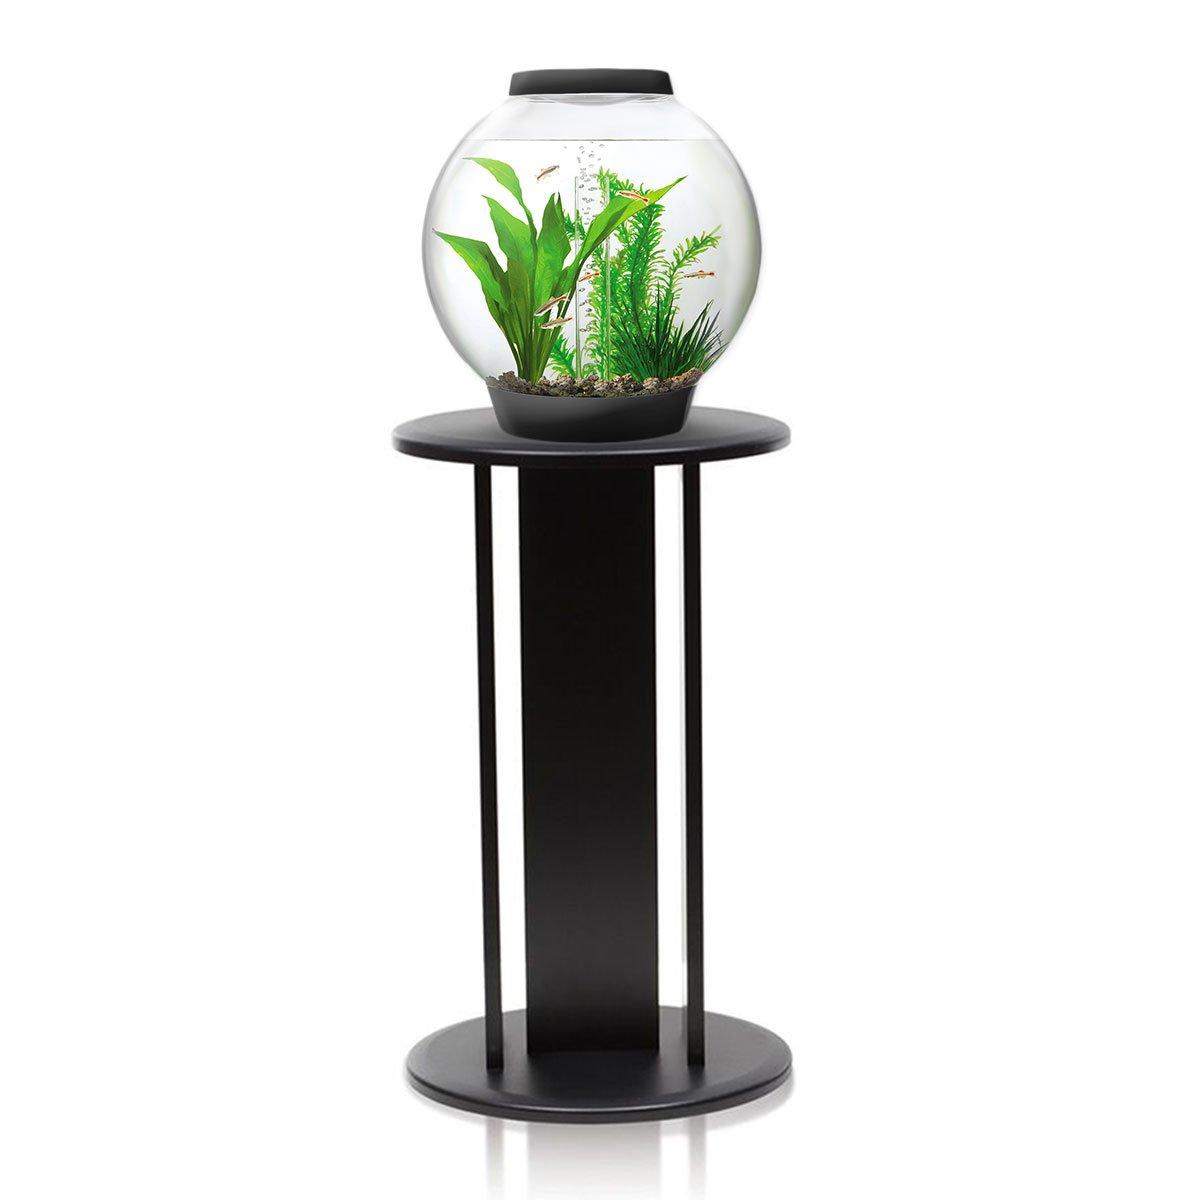 BiOrb Baby 15L Aquarium in Black with MCR LED Lighting & Black Stand